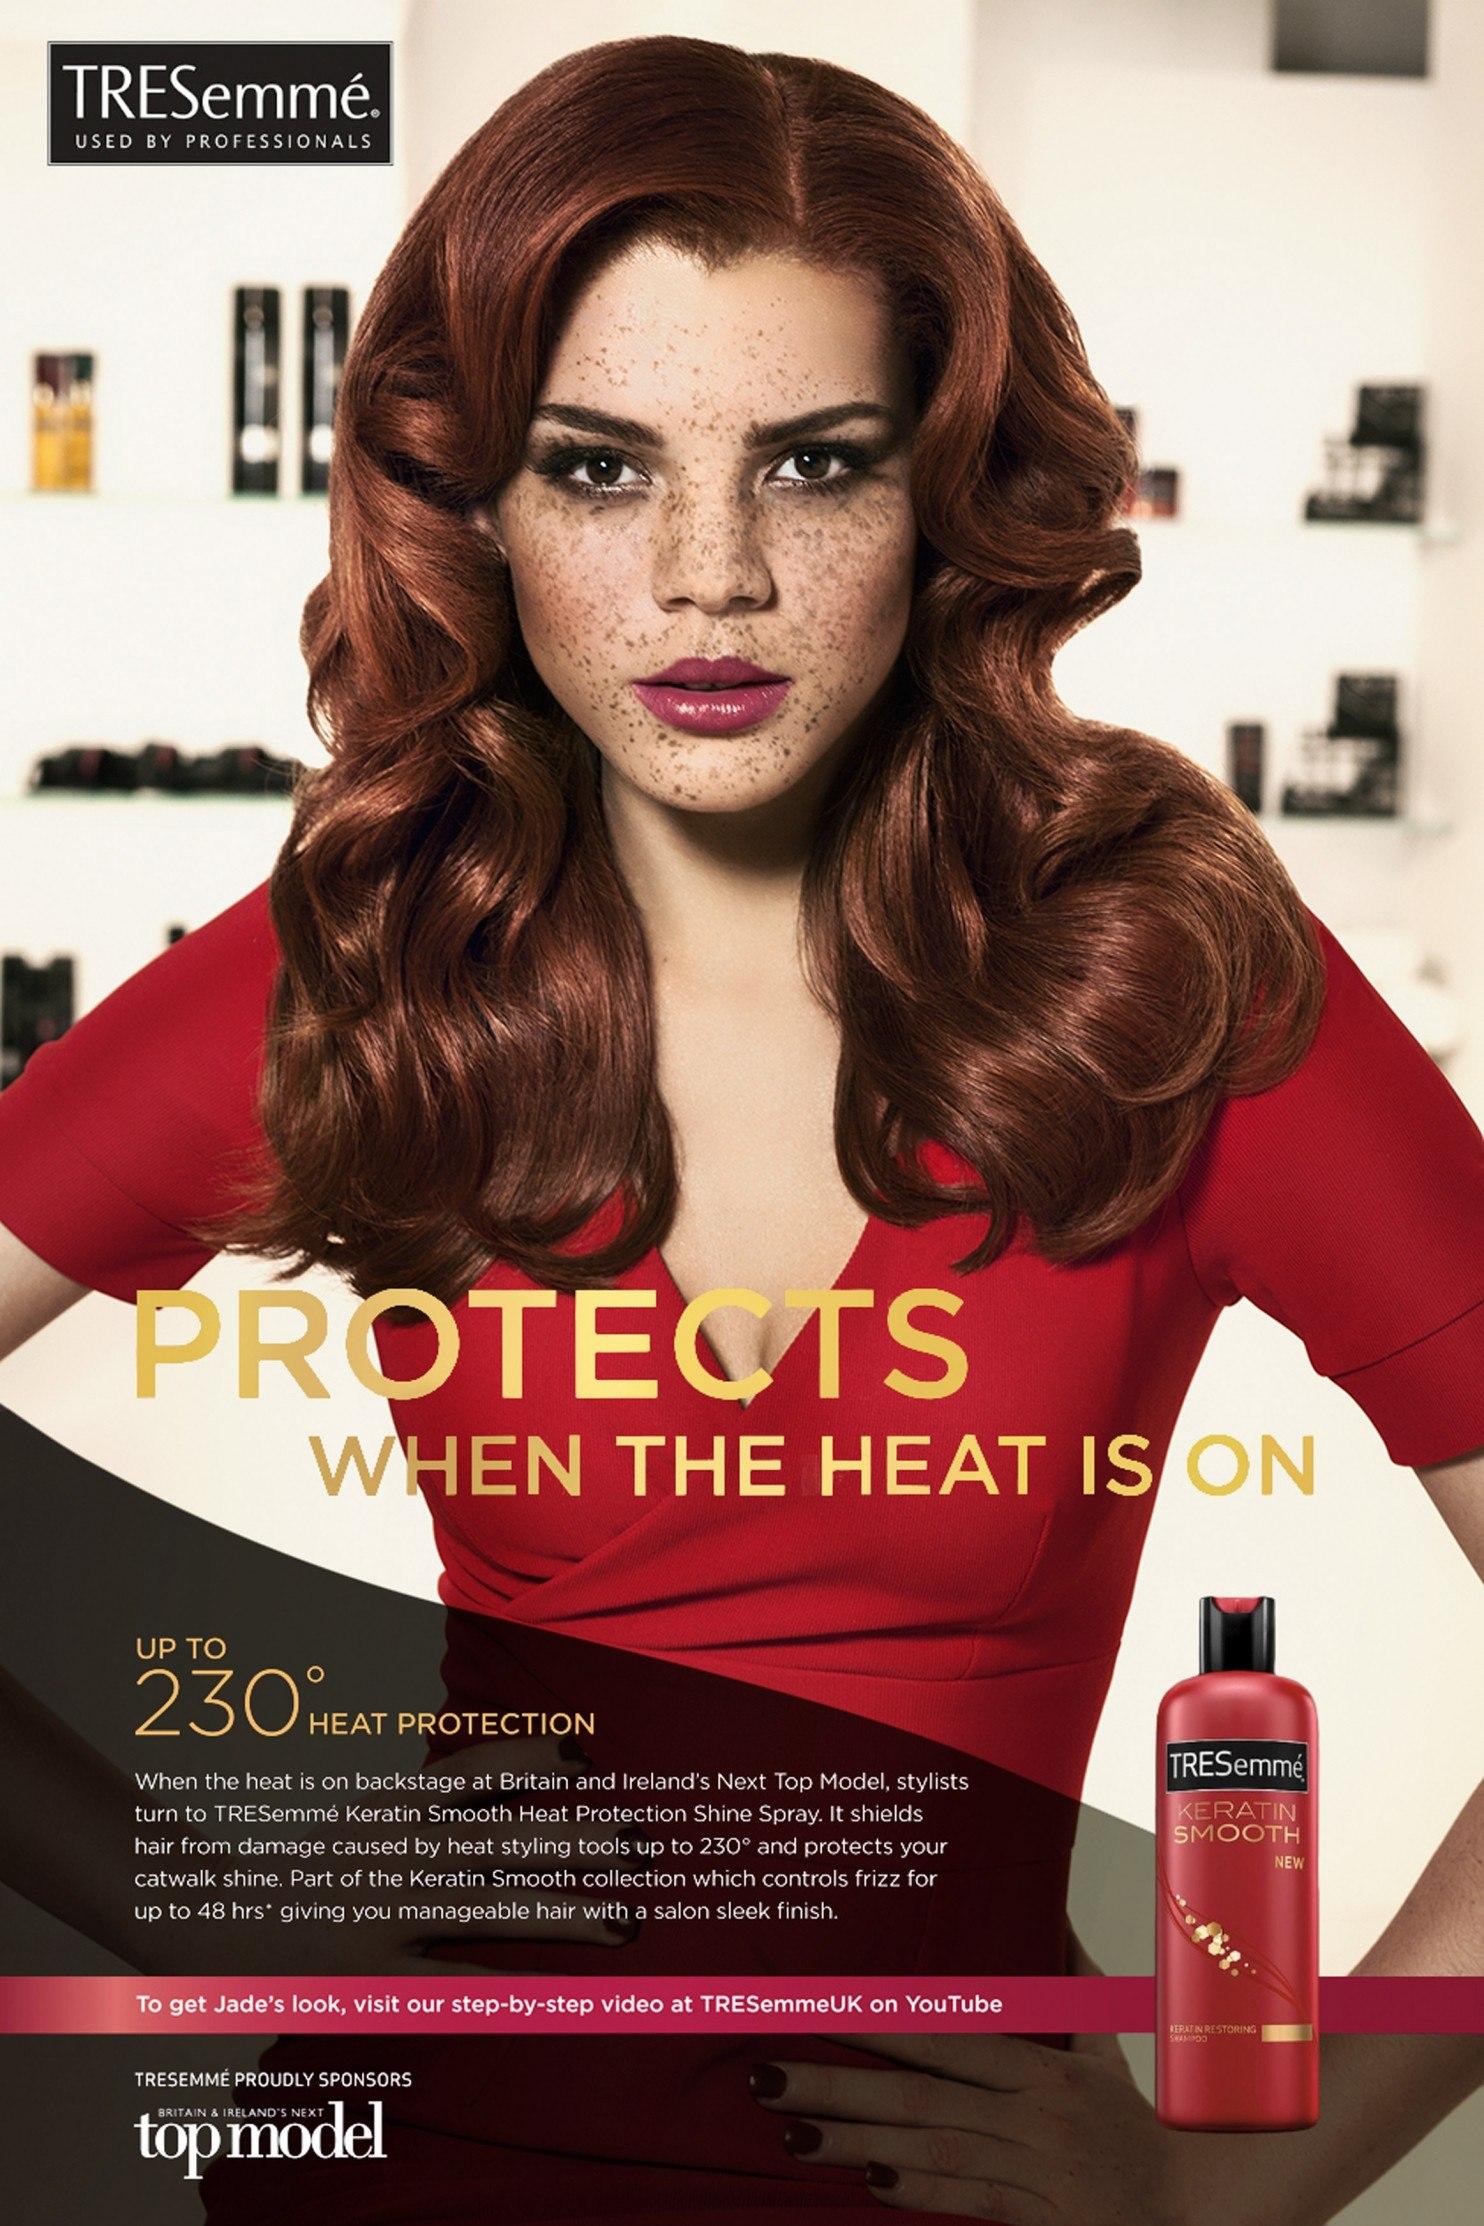 tresemme-hair-campaign-hair-letitia-britains-next-top-model-winner-ruth-rose-photographer-3-1484x2226.jpg